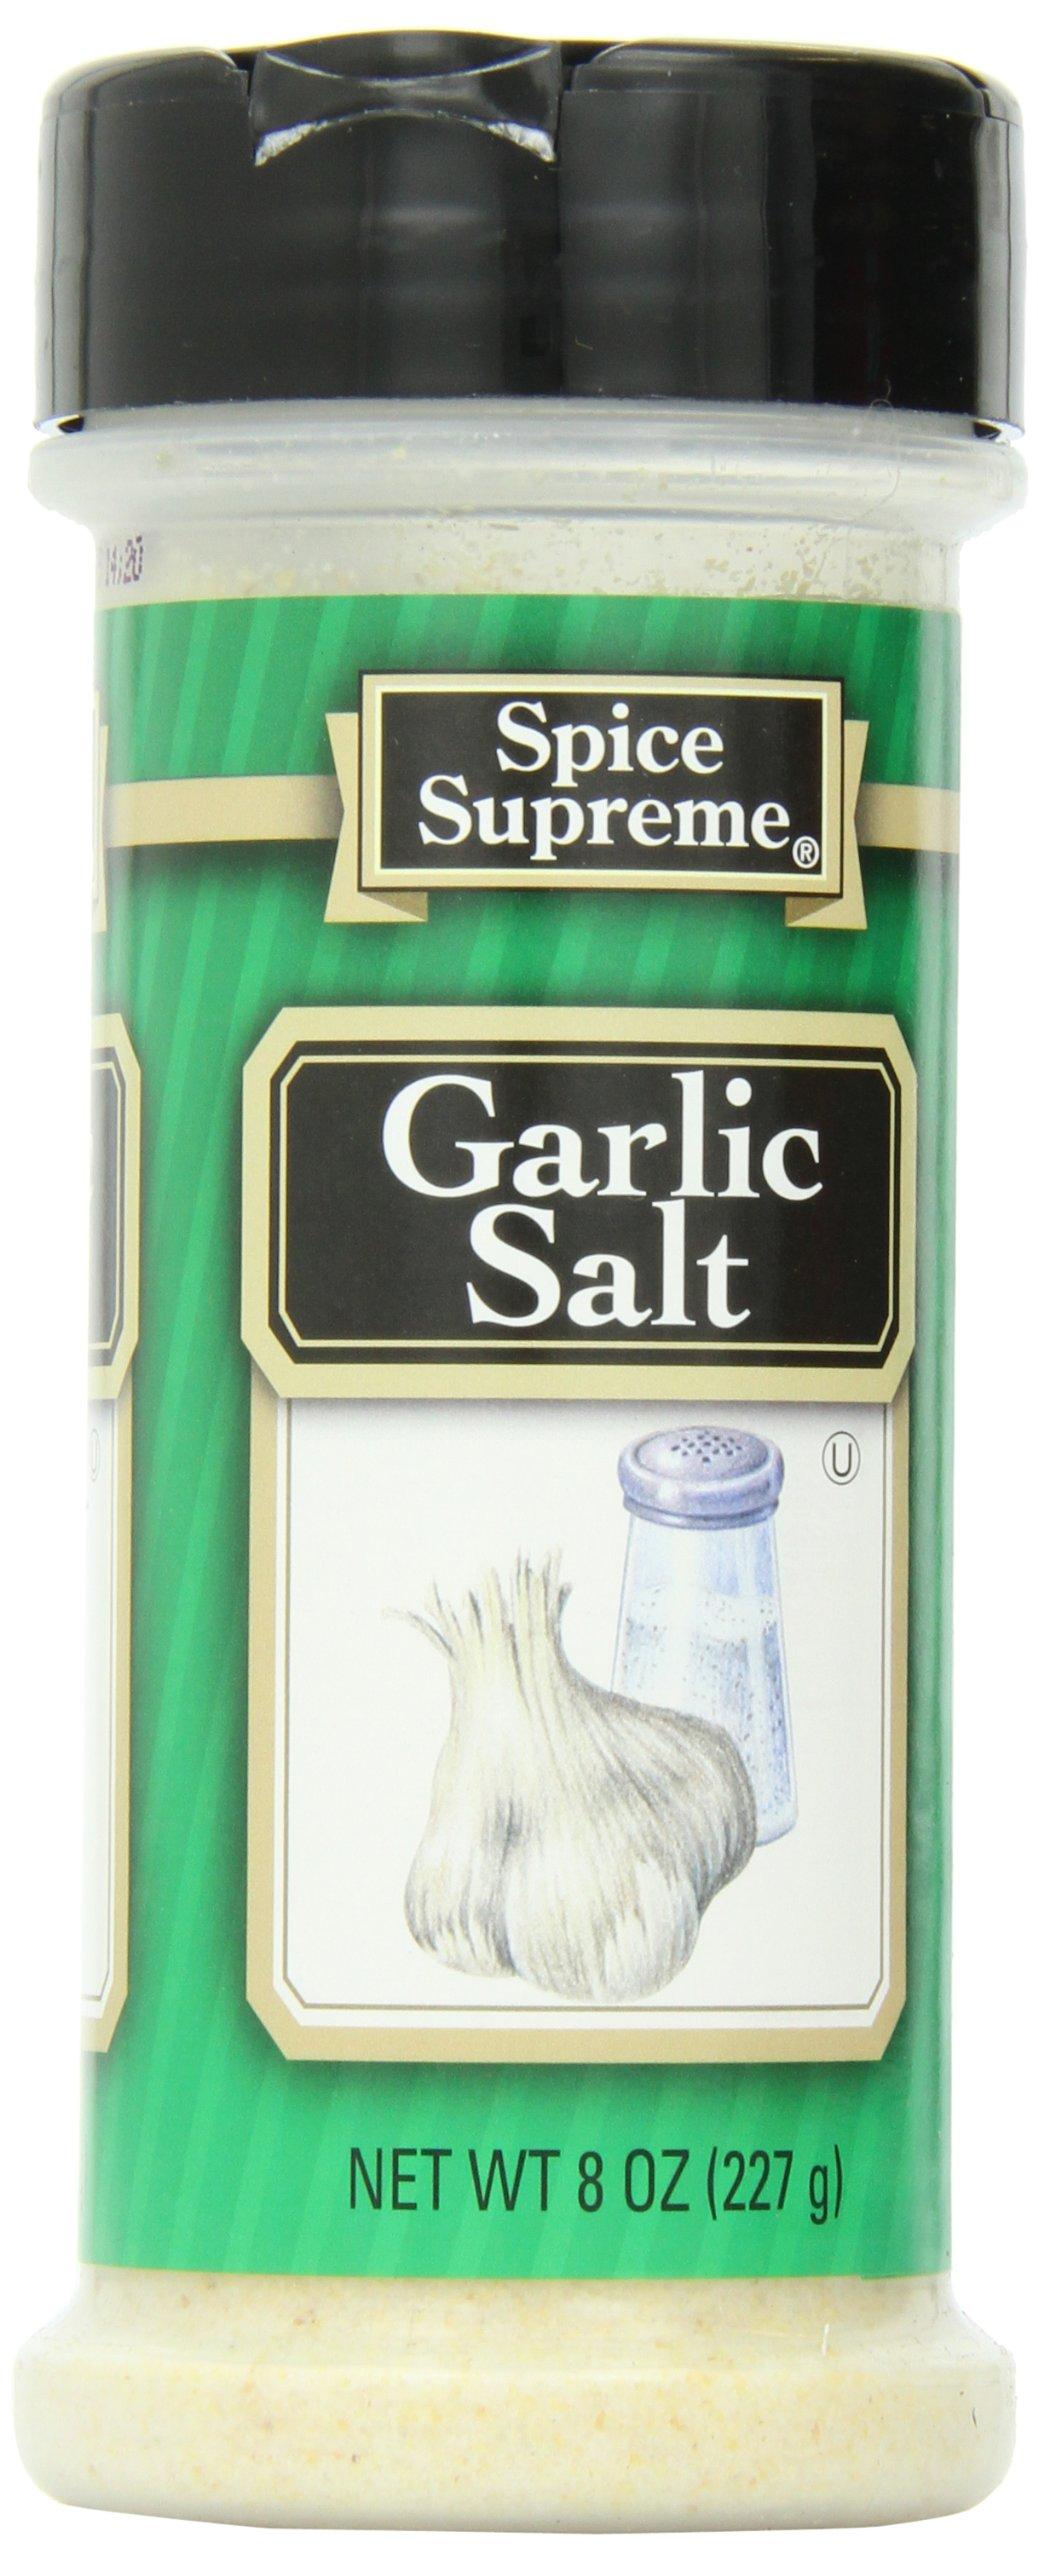 Spice Supreme Garlic Salt, 8-Ounce (Pack of 12)